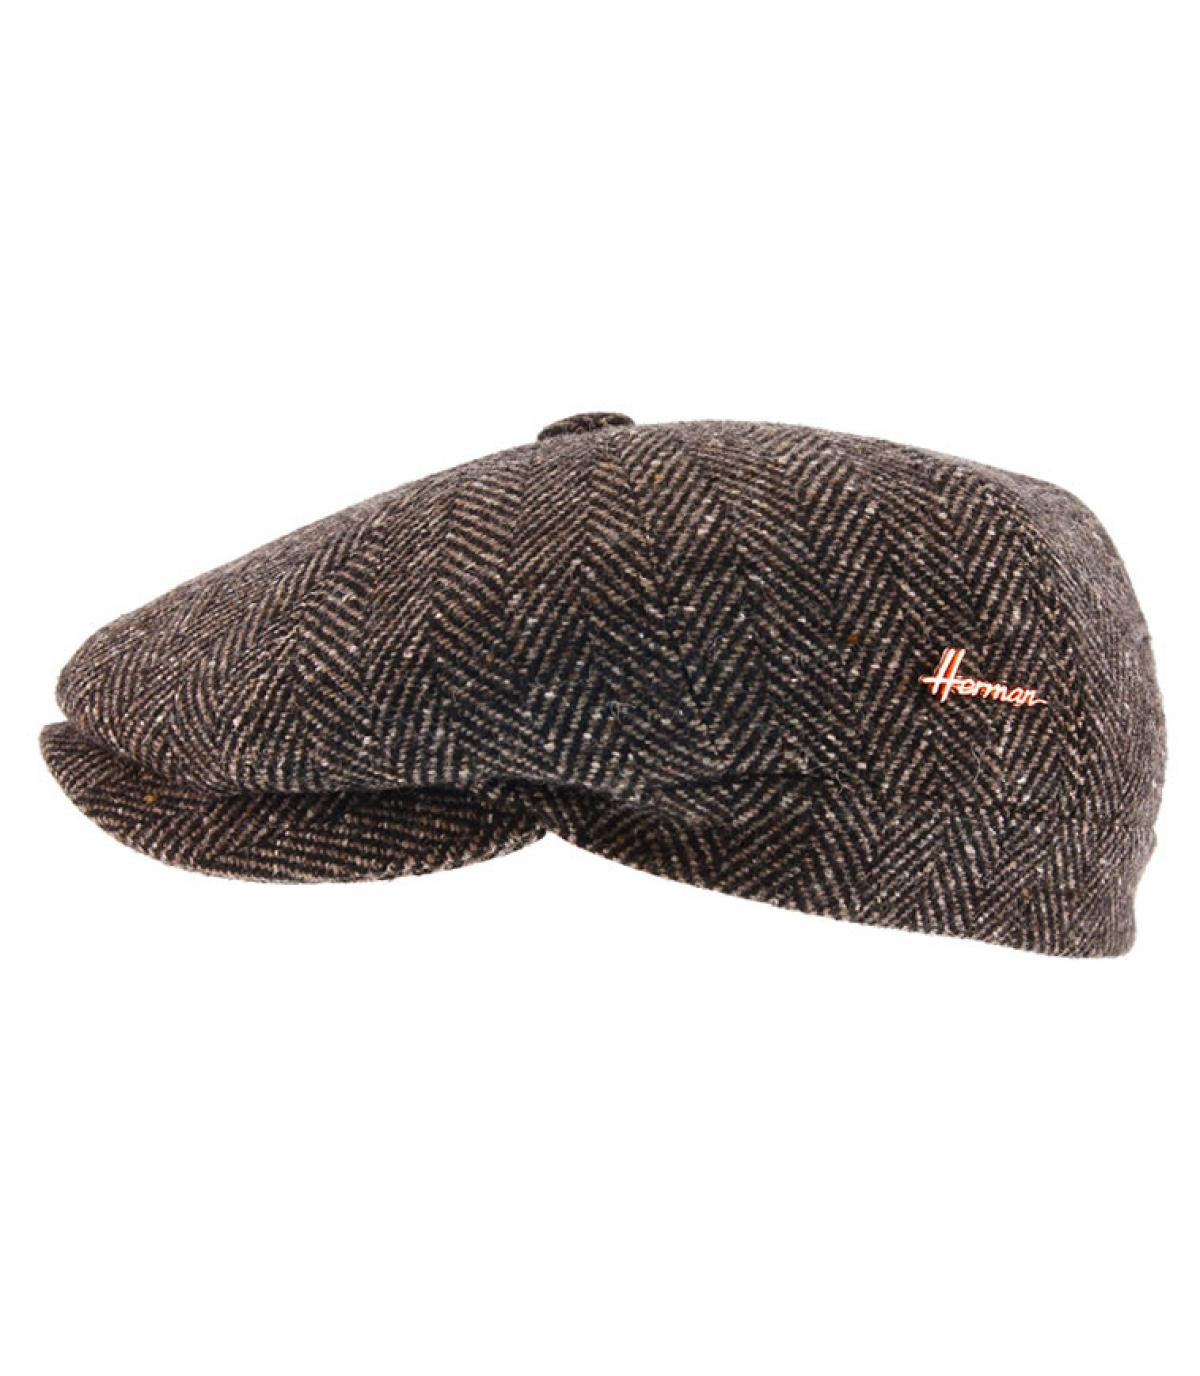 Details Advancer Wool brown - afbeeling 2